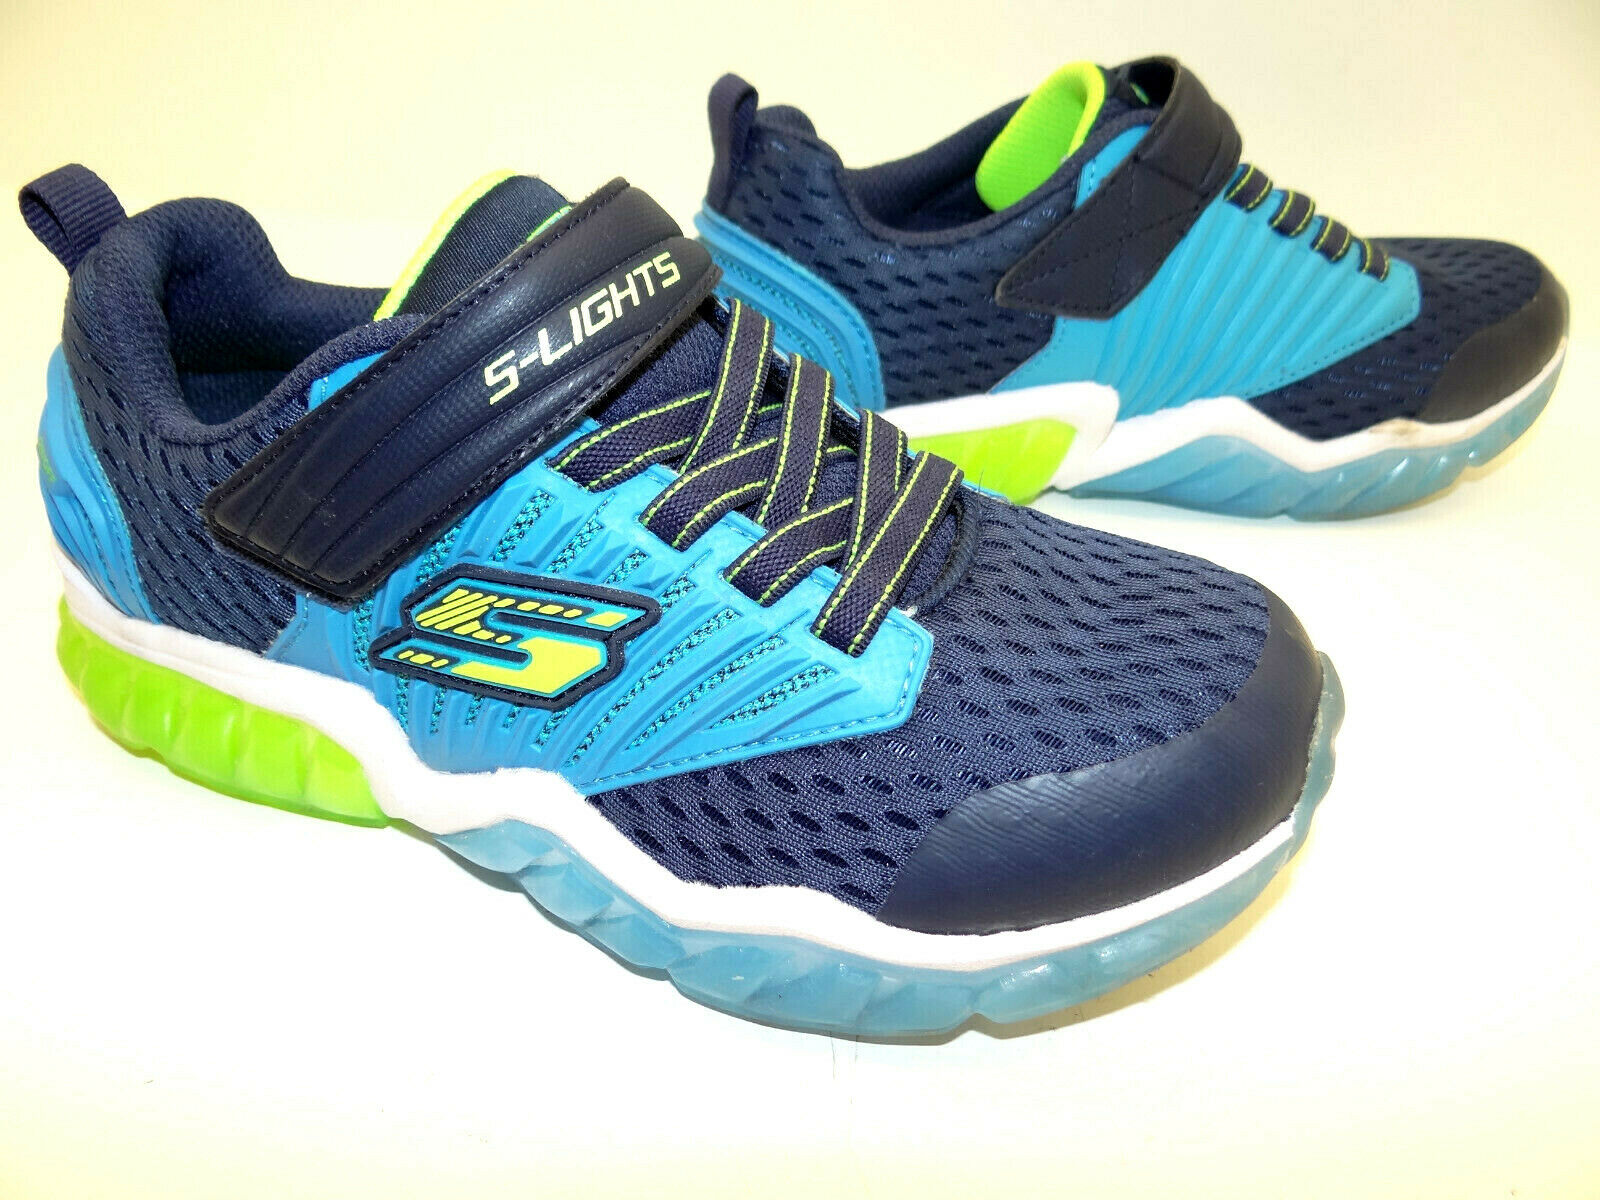 Skechers (Lich) Jungs Schuhe Outdoor Wander  Sneaker Schnürschuhe Sneaker Gr. 33